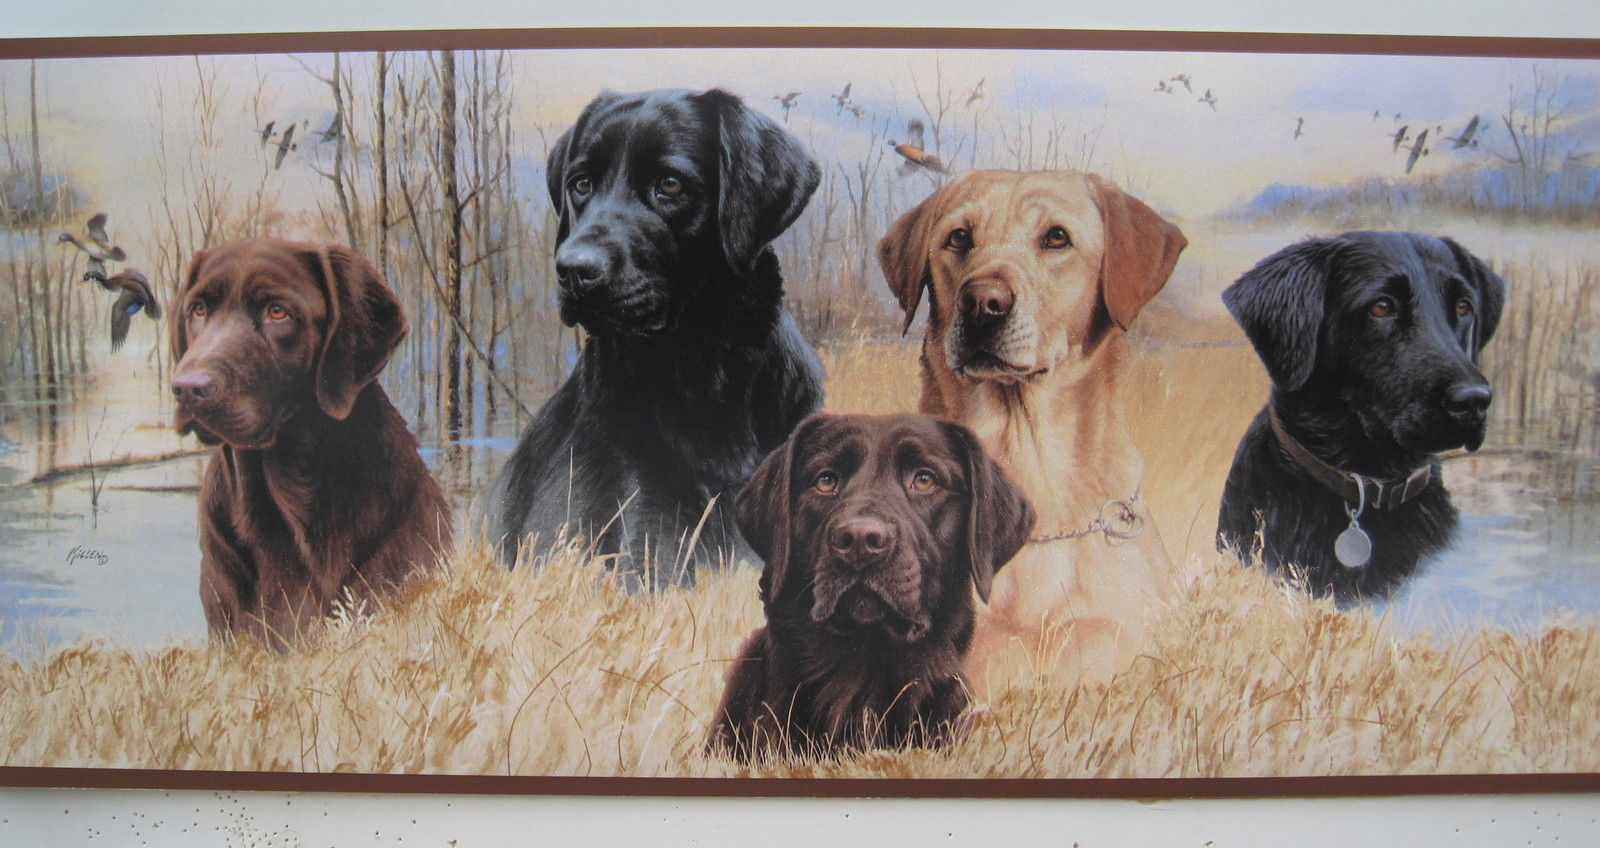 LABRADOR RETRIEVER DOGS DUCK HUNTING Wallpaper Border 9 1600x848